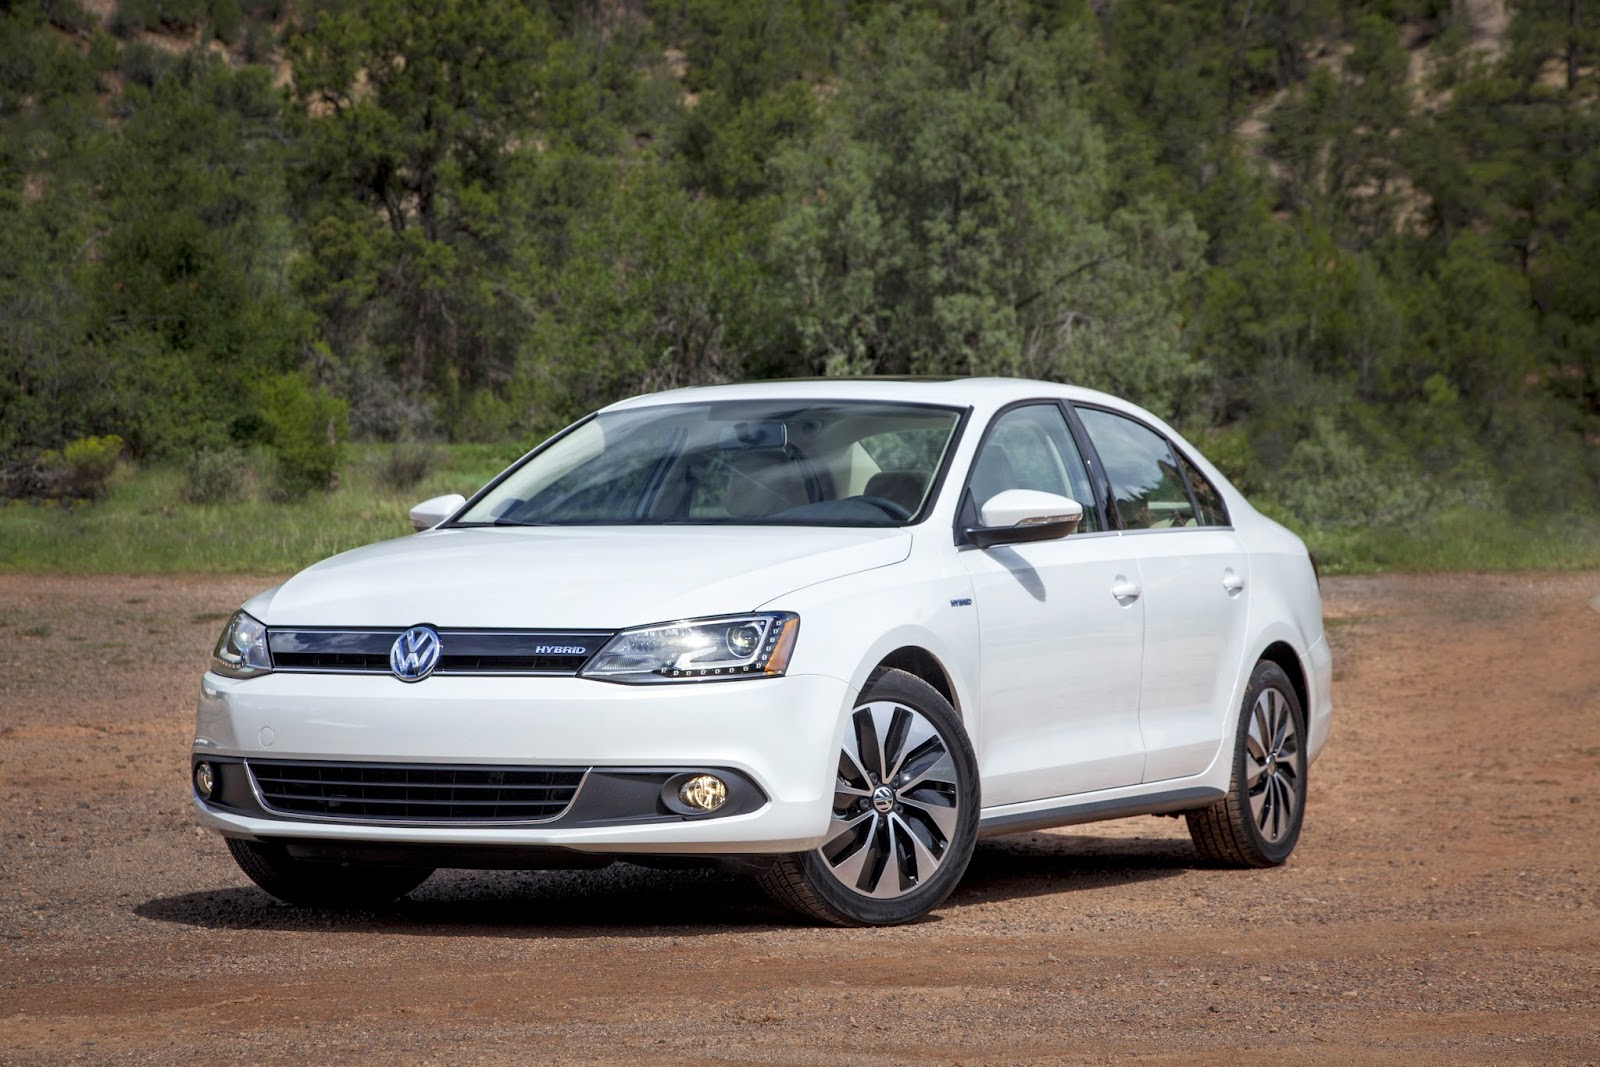 Front 3/4 view of 2015 Volkswagen Jetta Hybrid